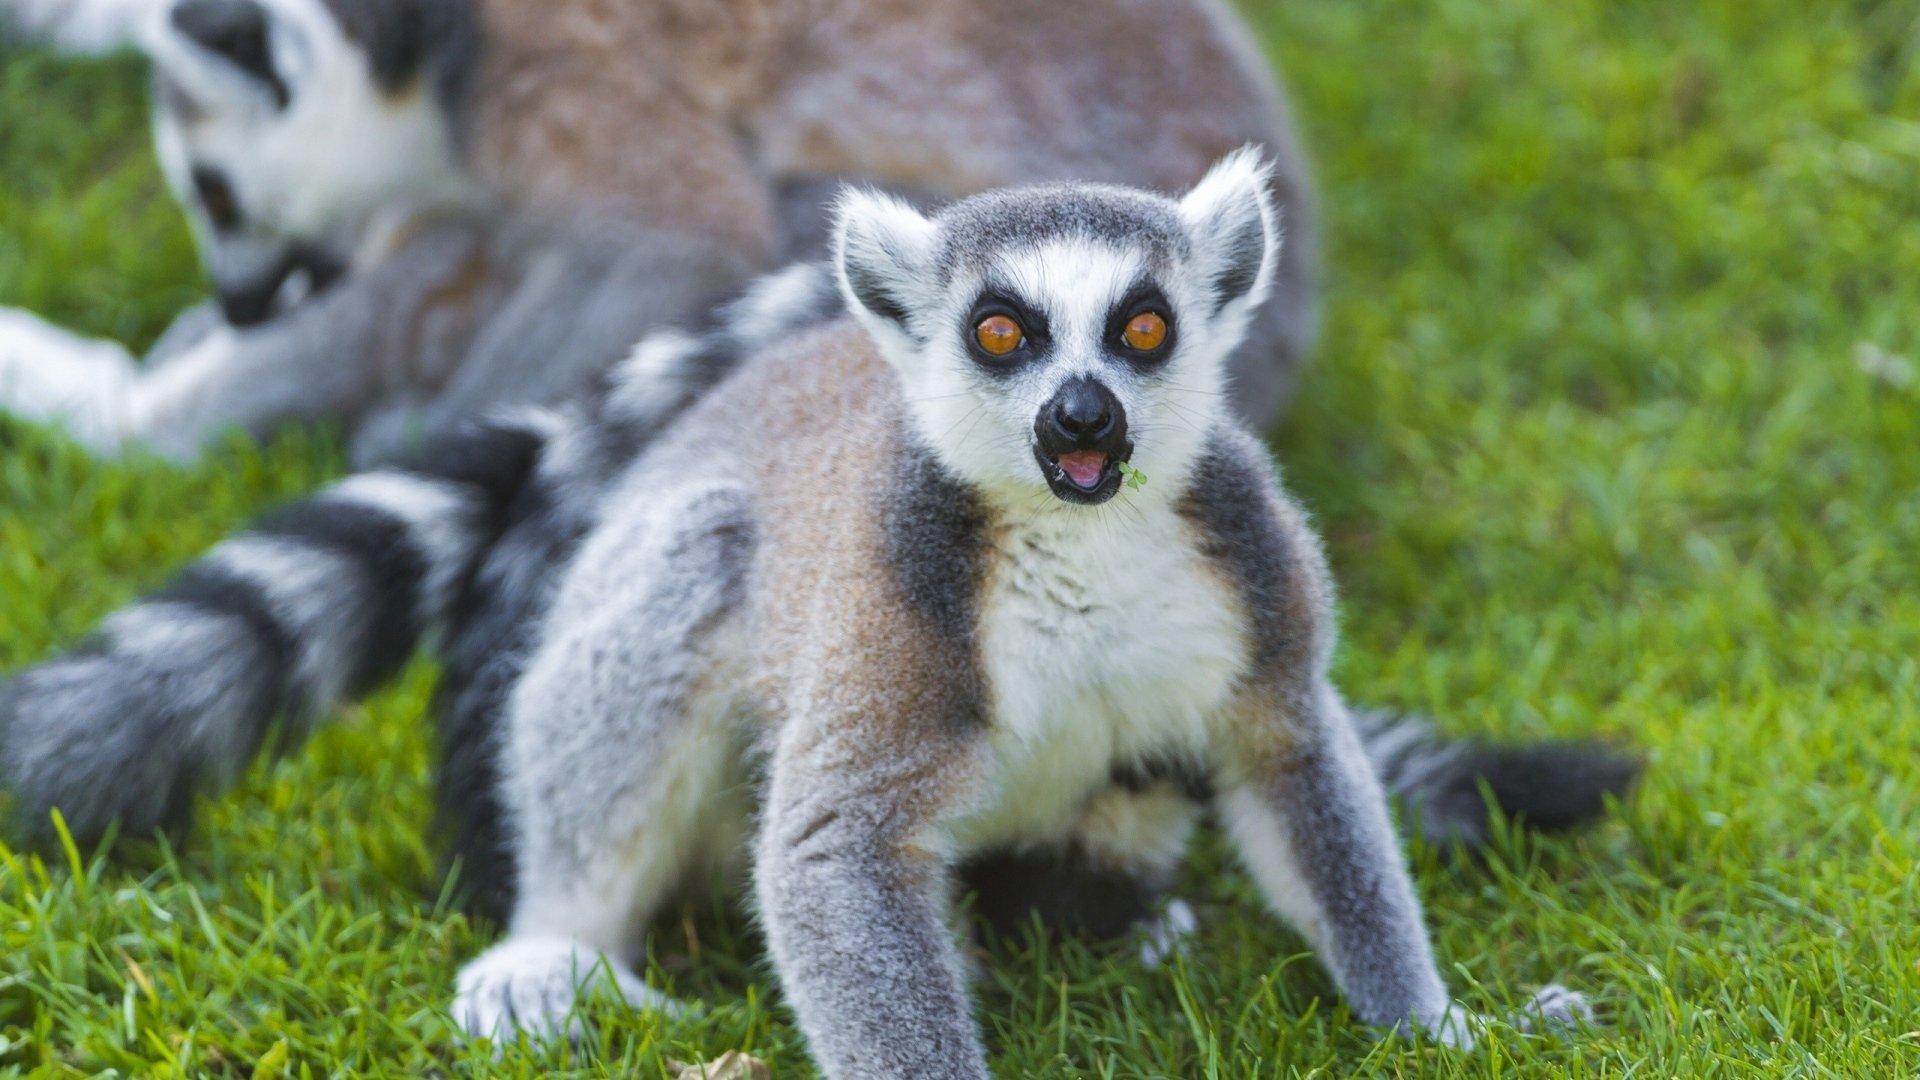 Lemur hd wallpaper 1080